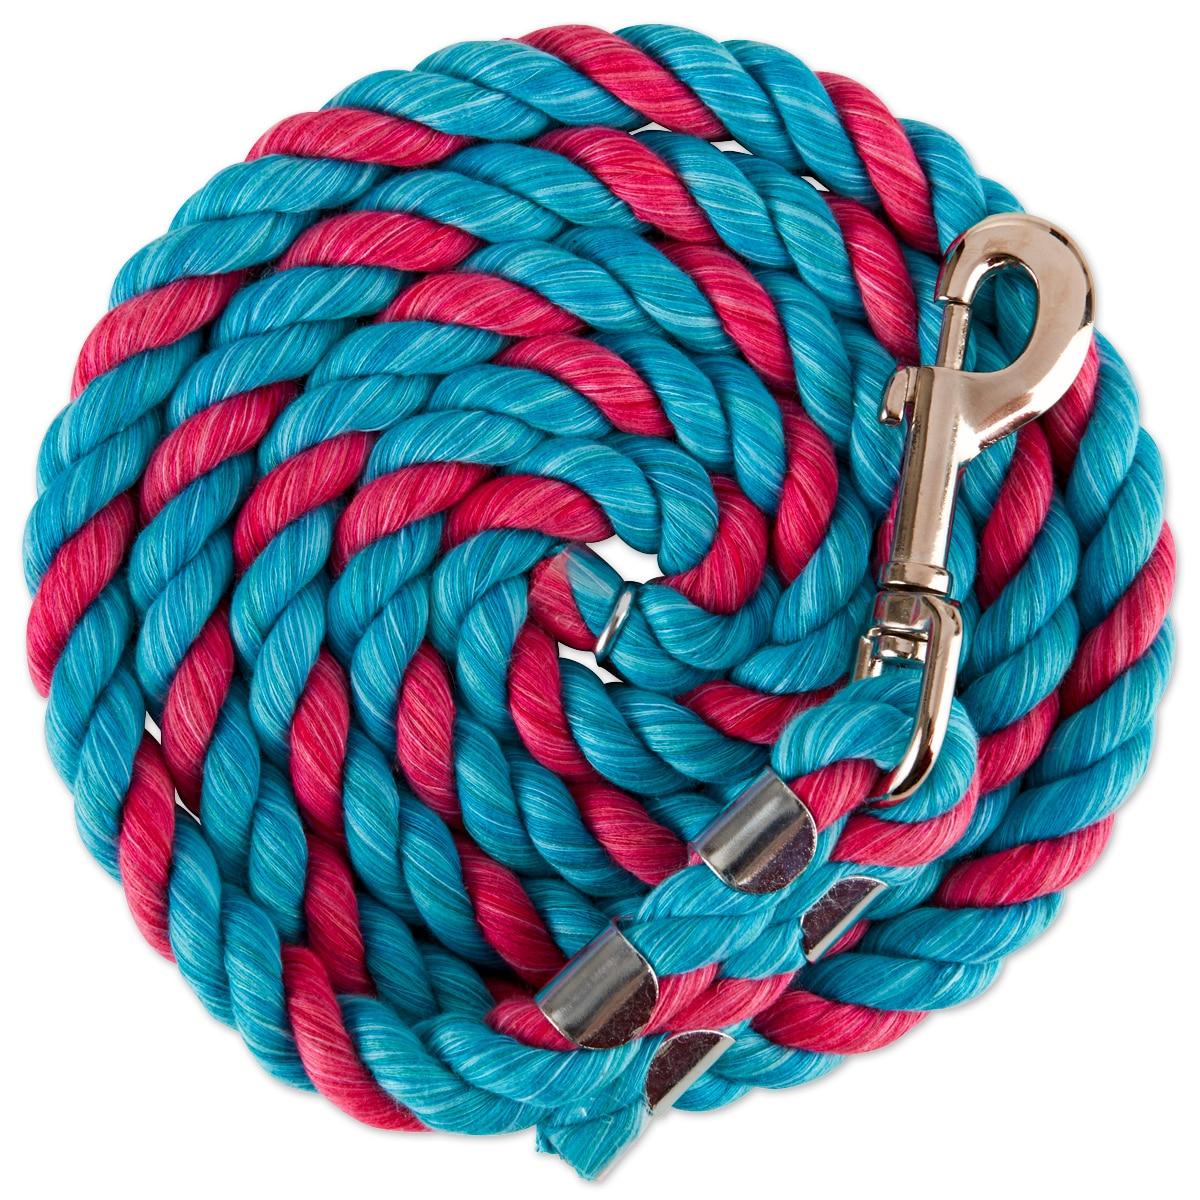 Perris Cotton Multi-Colored Leads 6-Feet